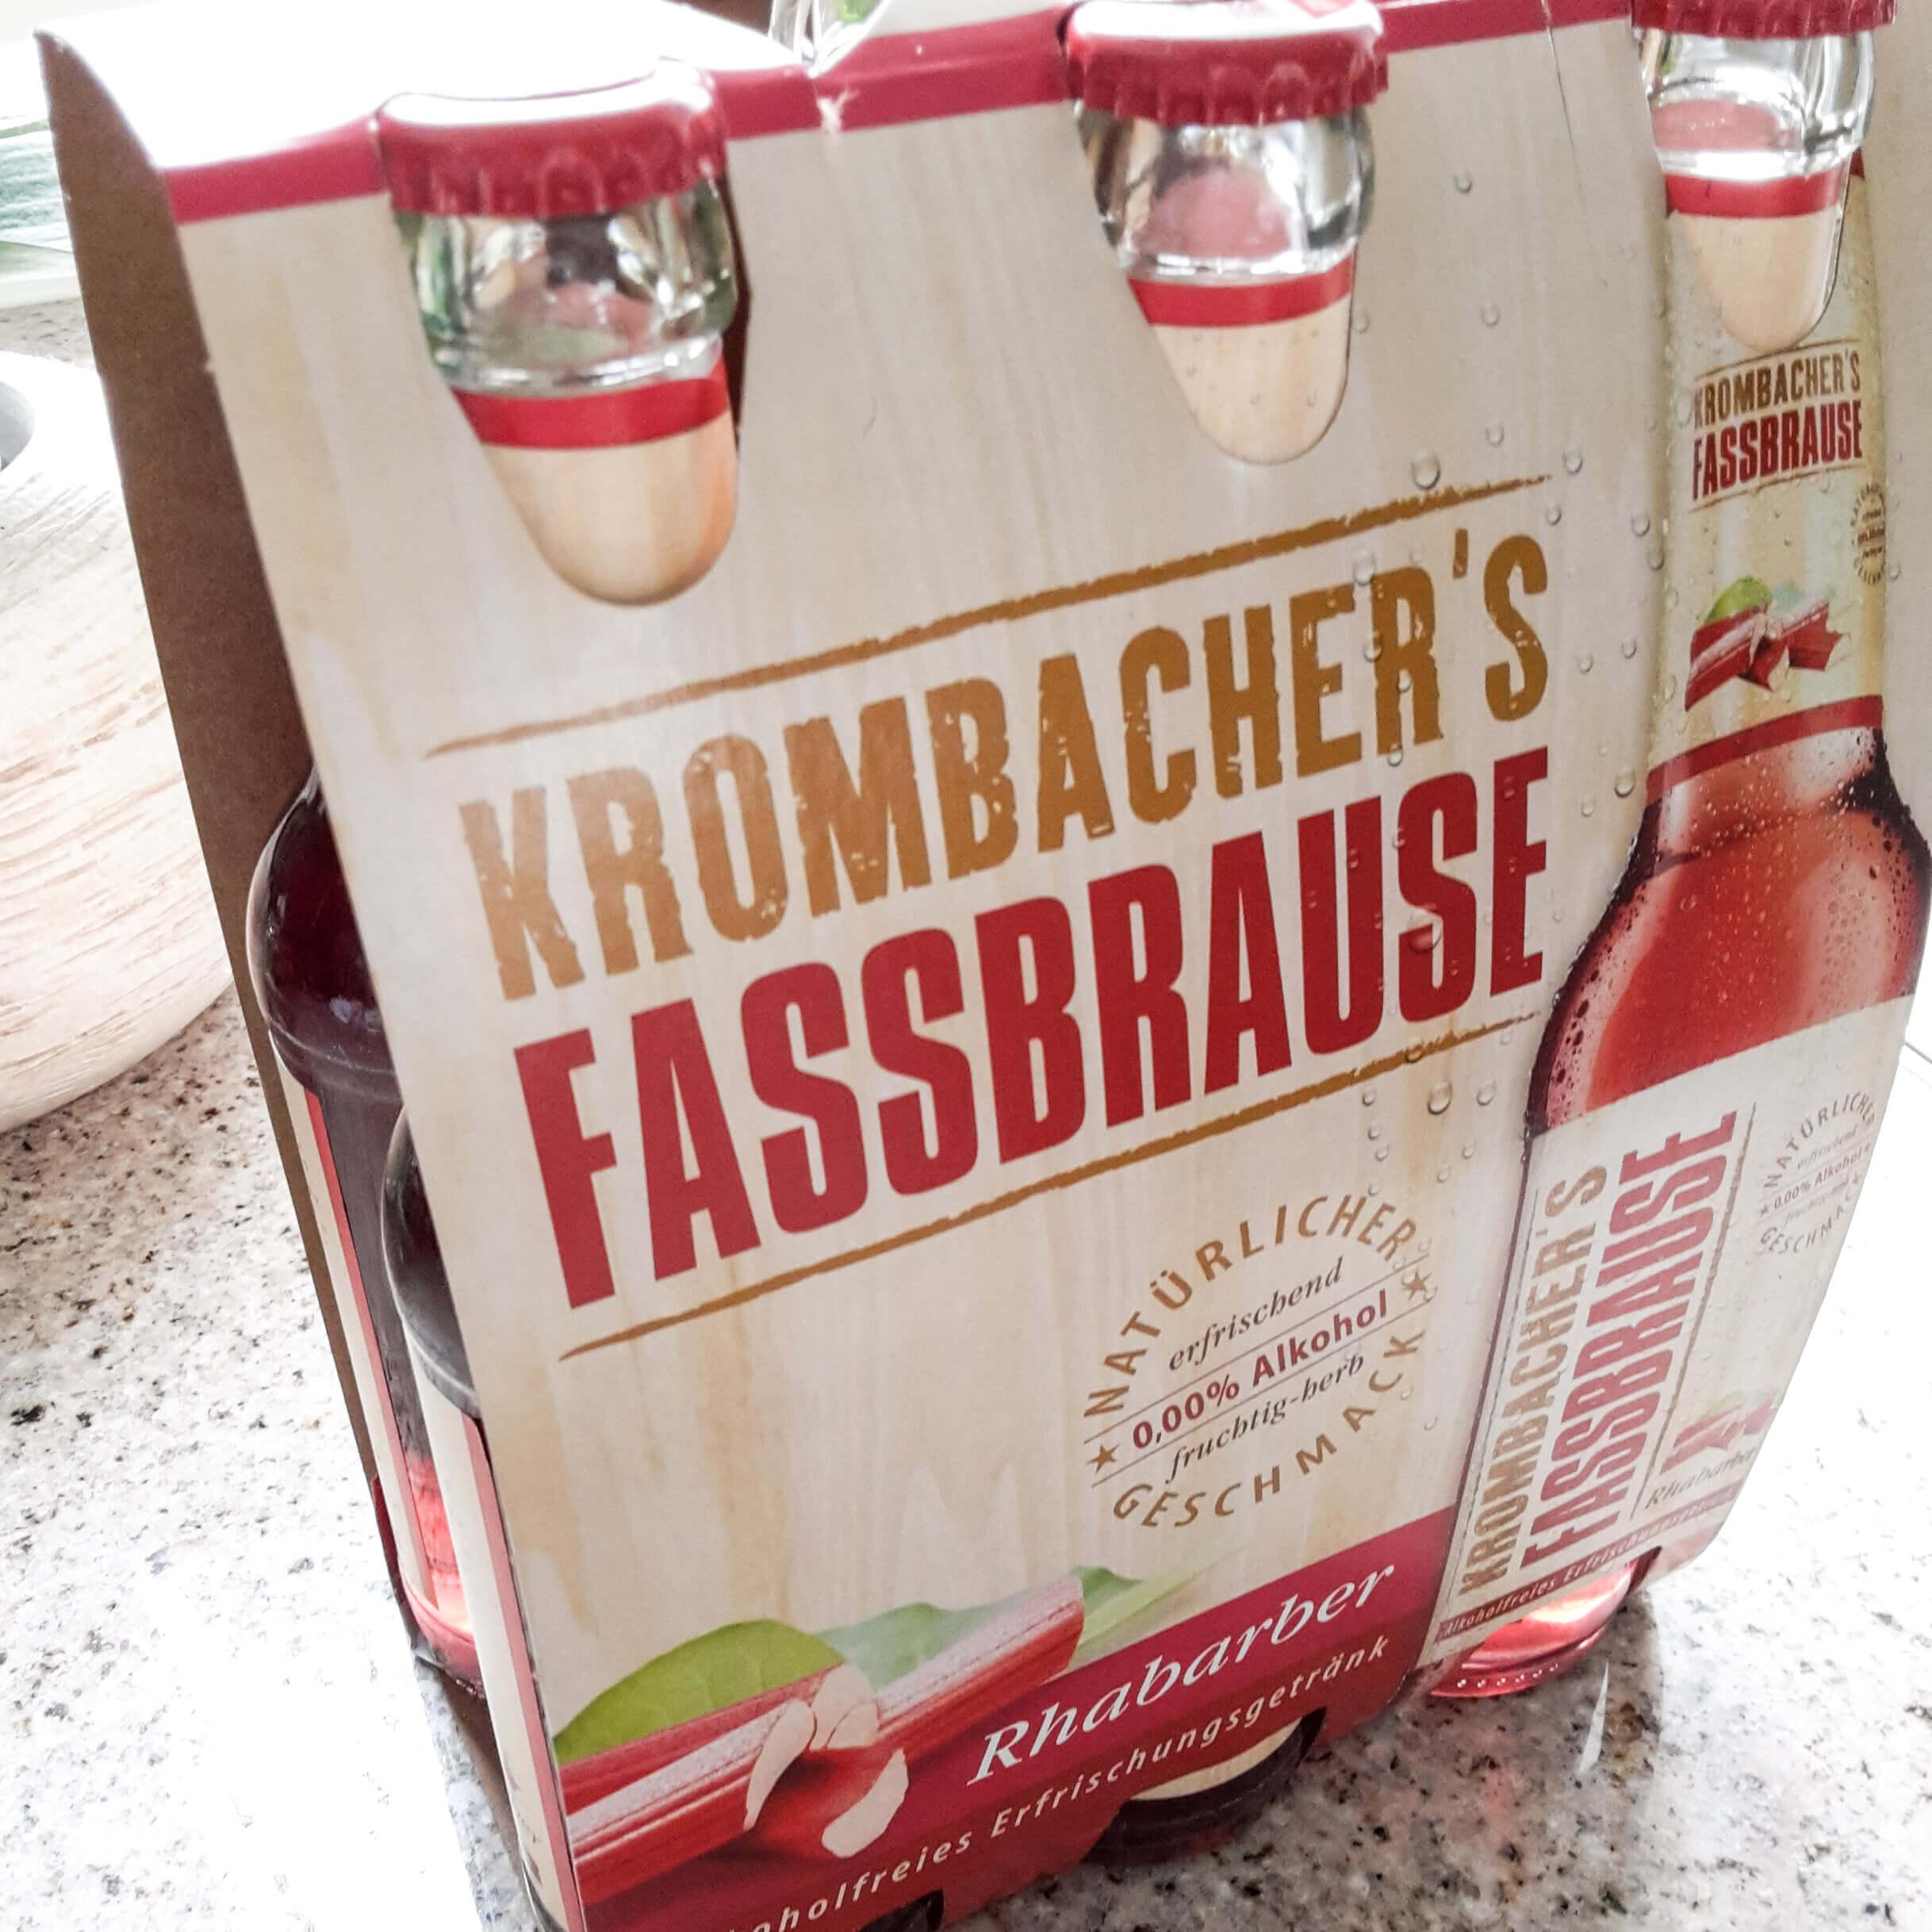 Krombacher Rhabarber